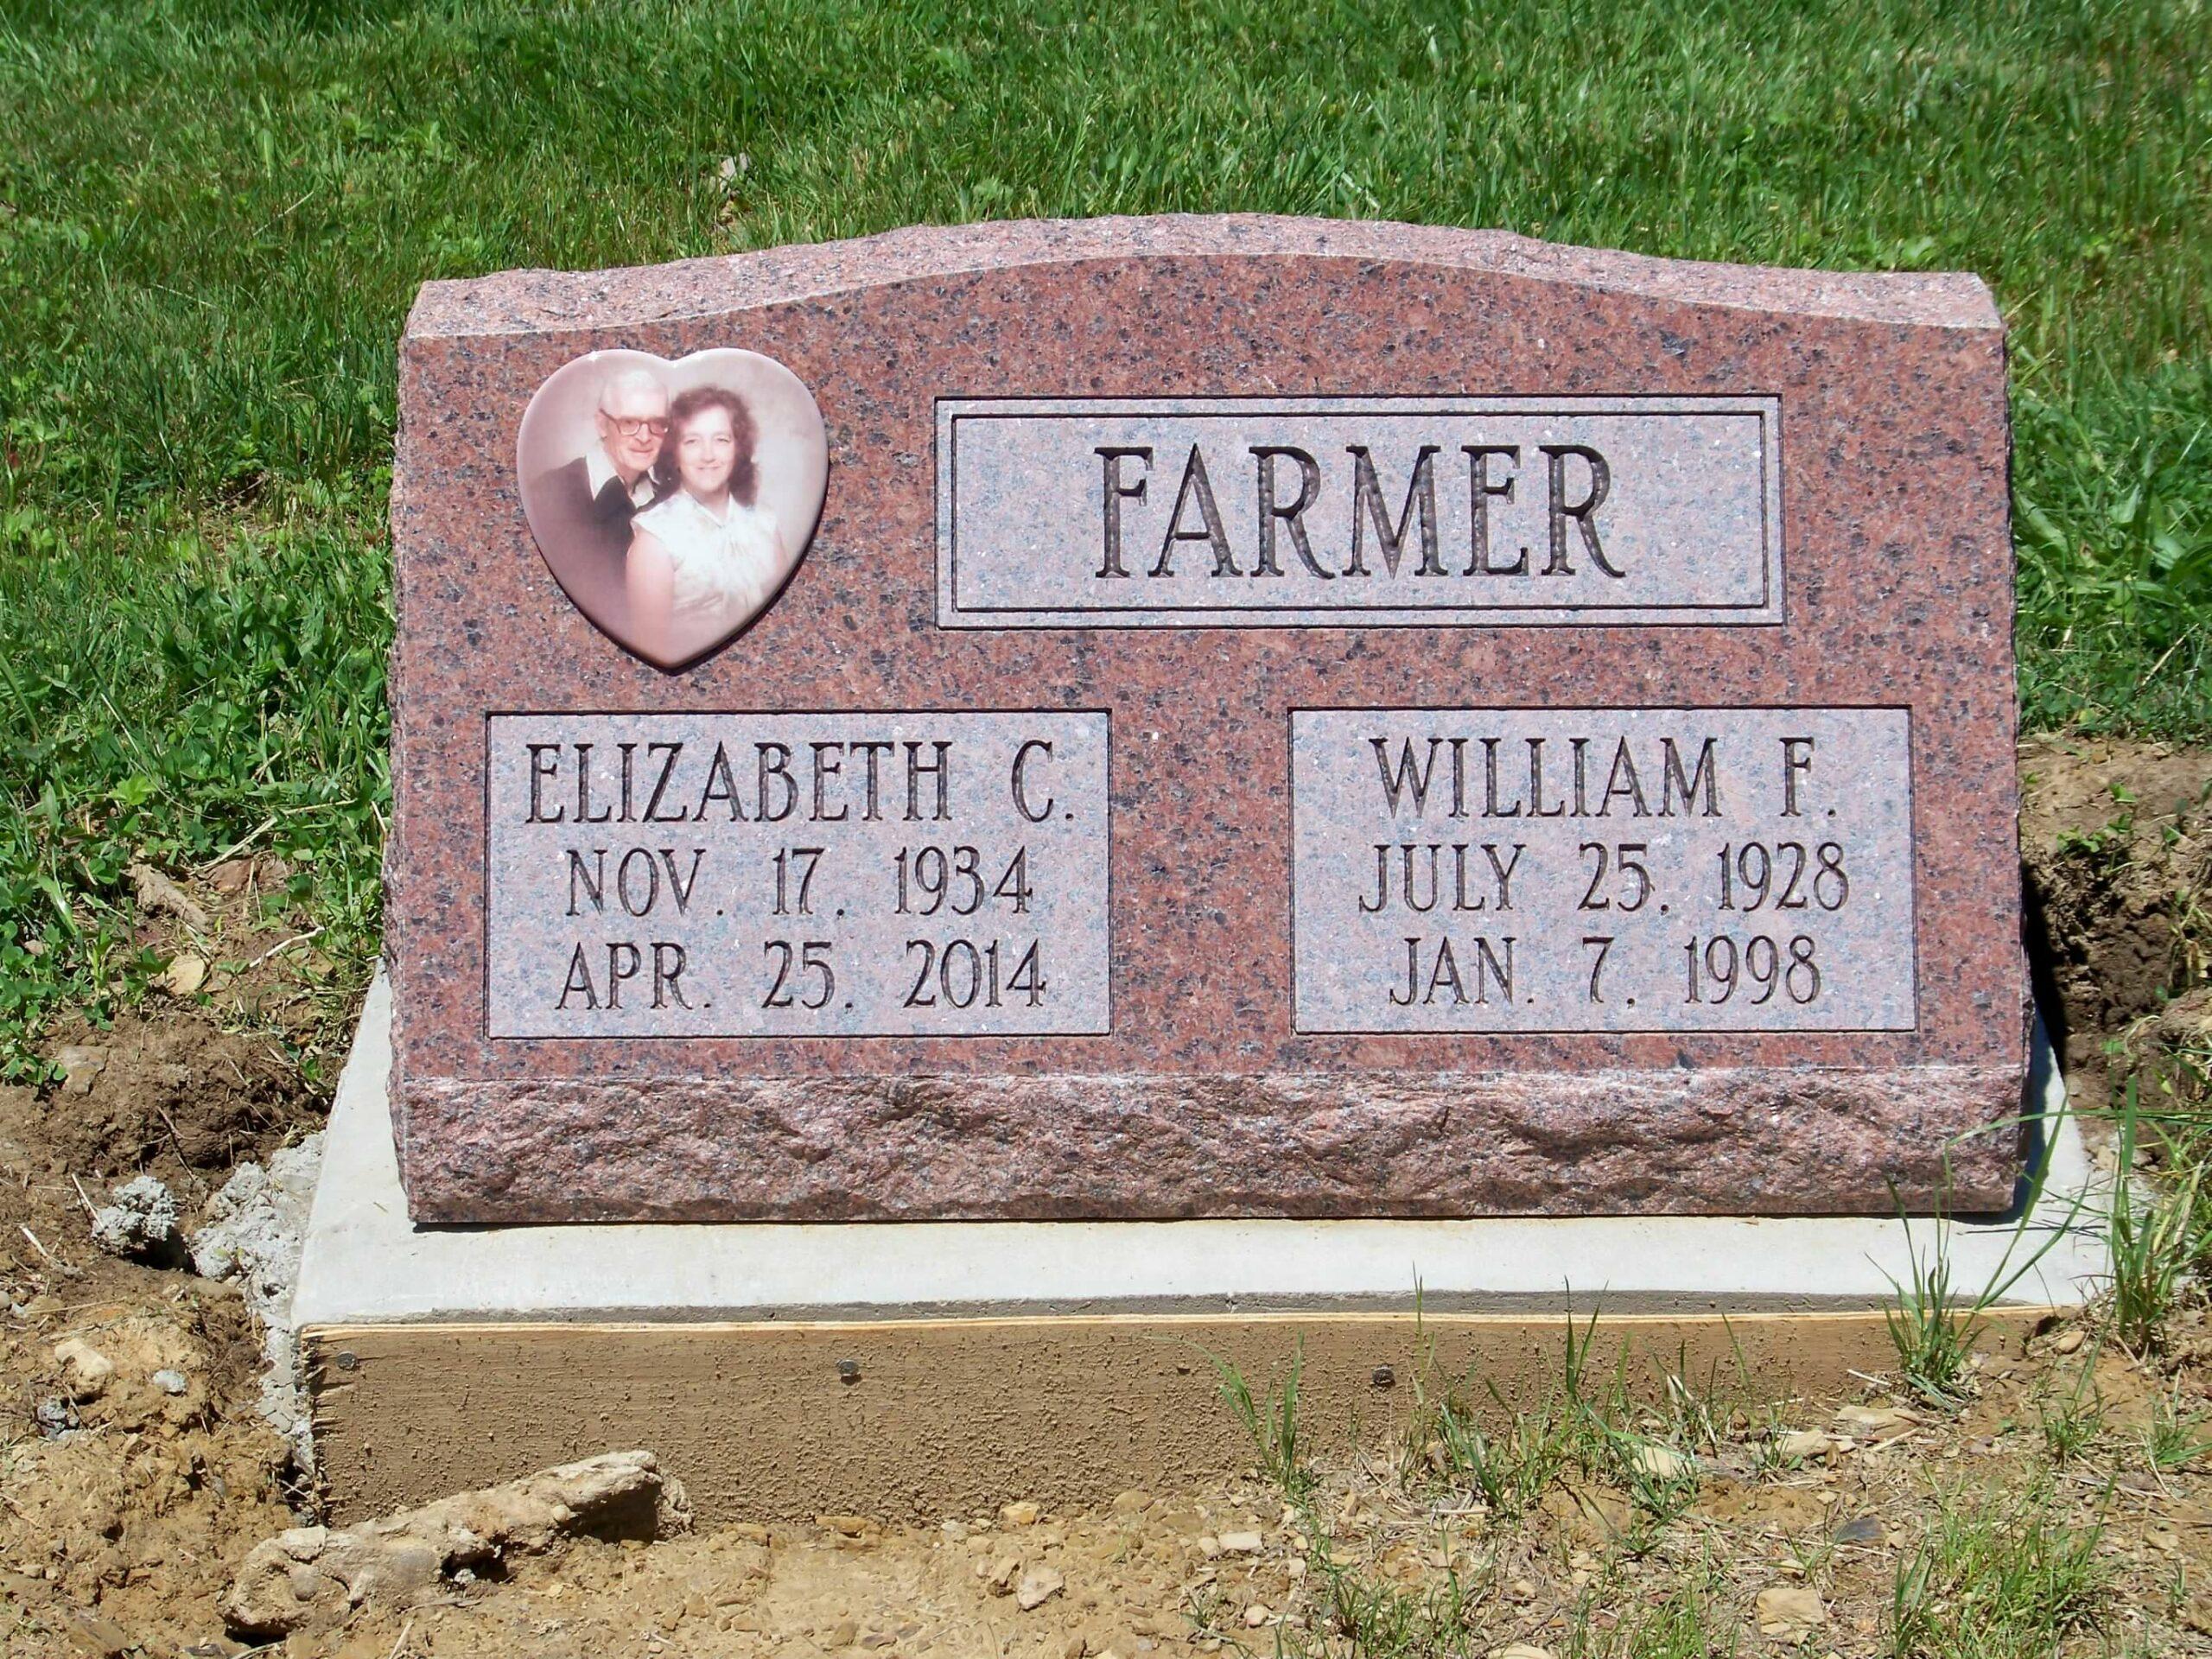 Farmer, William